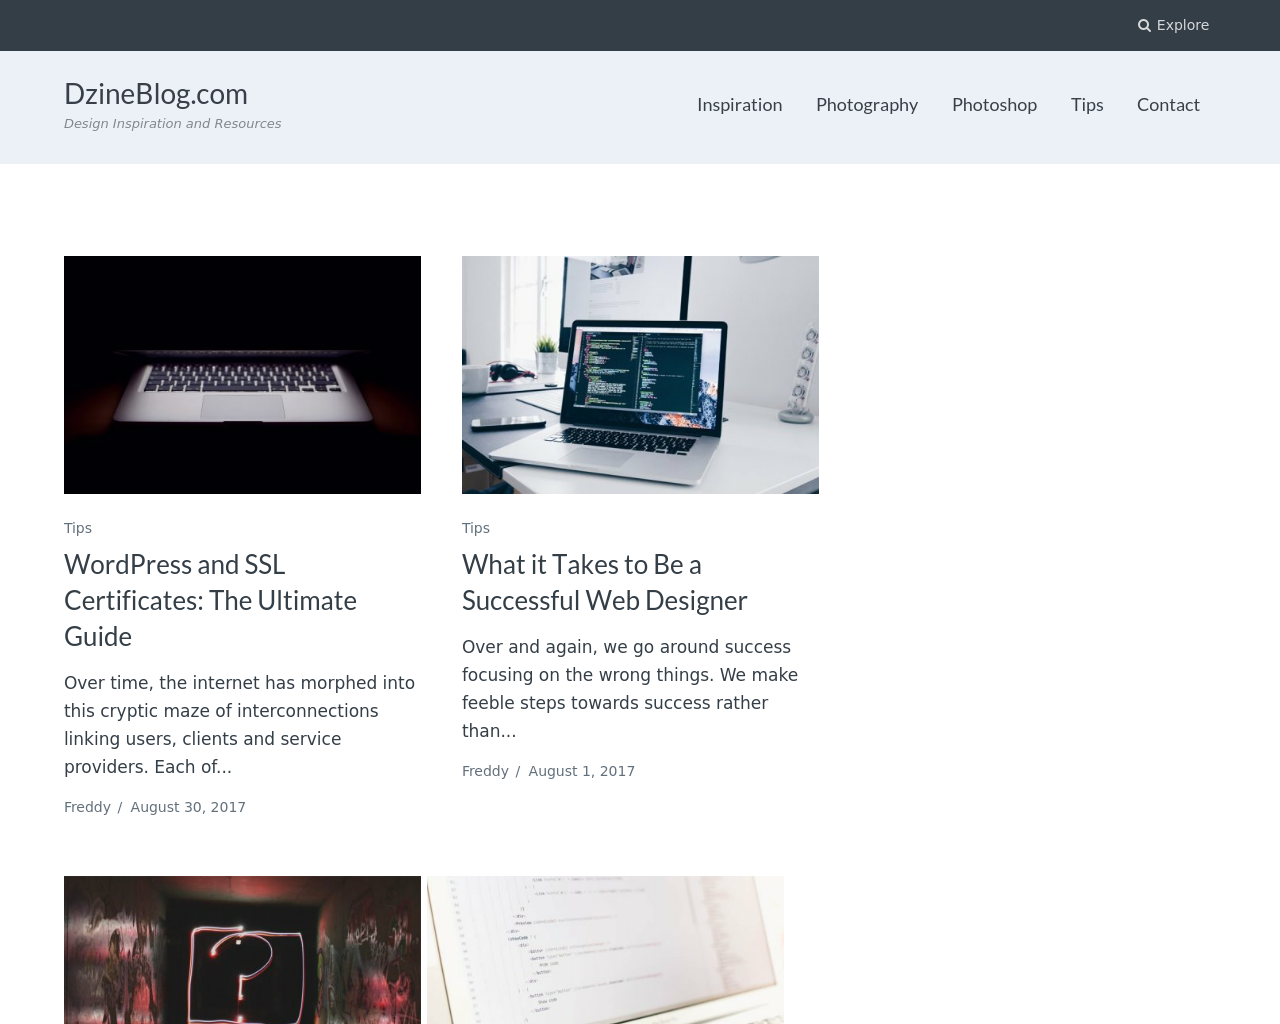 DzineBlog-Advertising-Reviews-Pricing